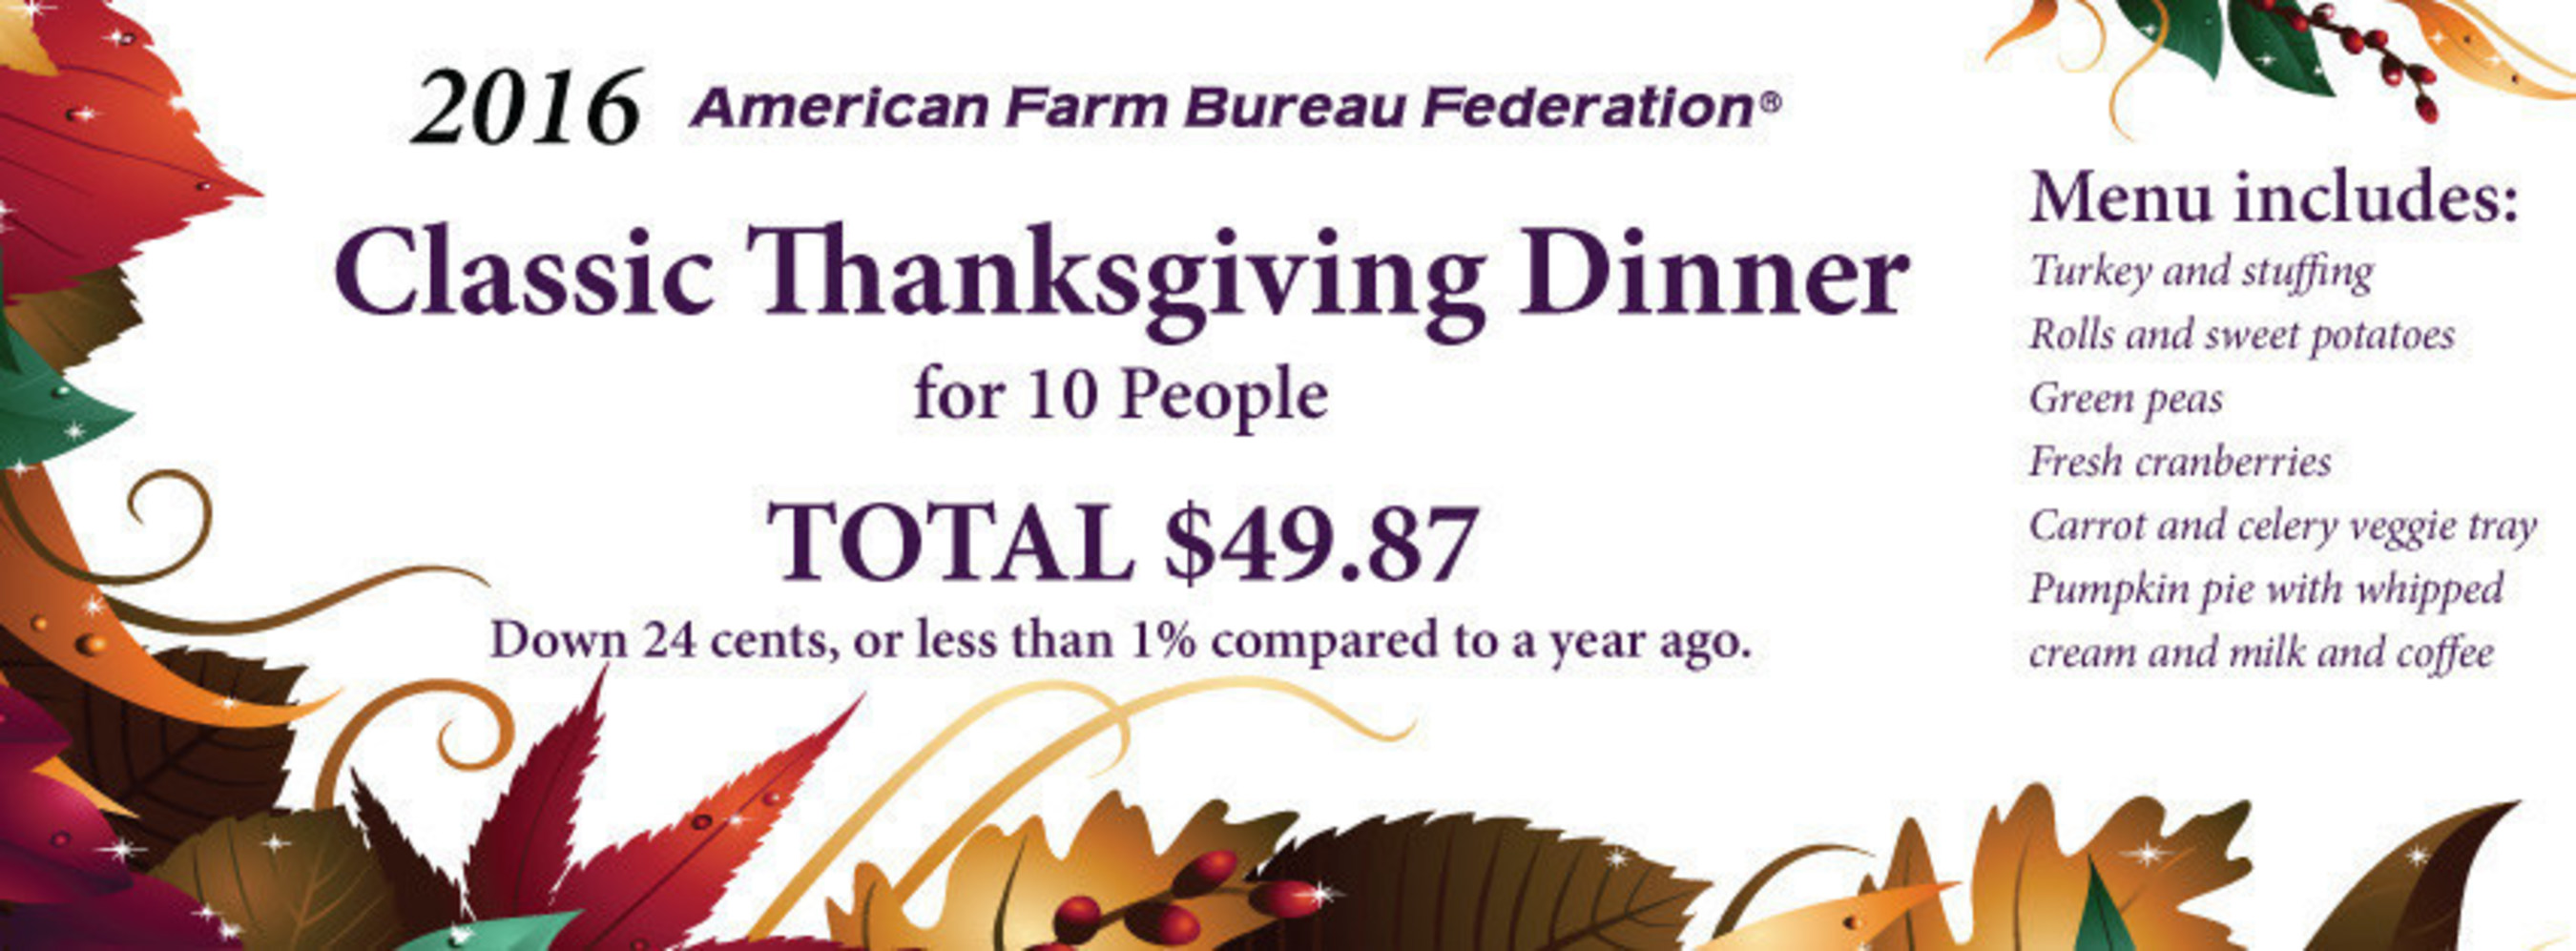 2016 American Farm Bureau Federation Annual Thanksgiving Dinner Survey